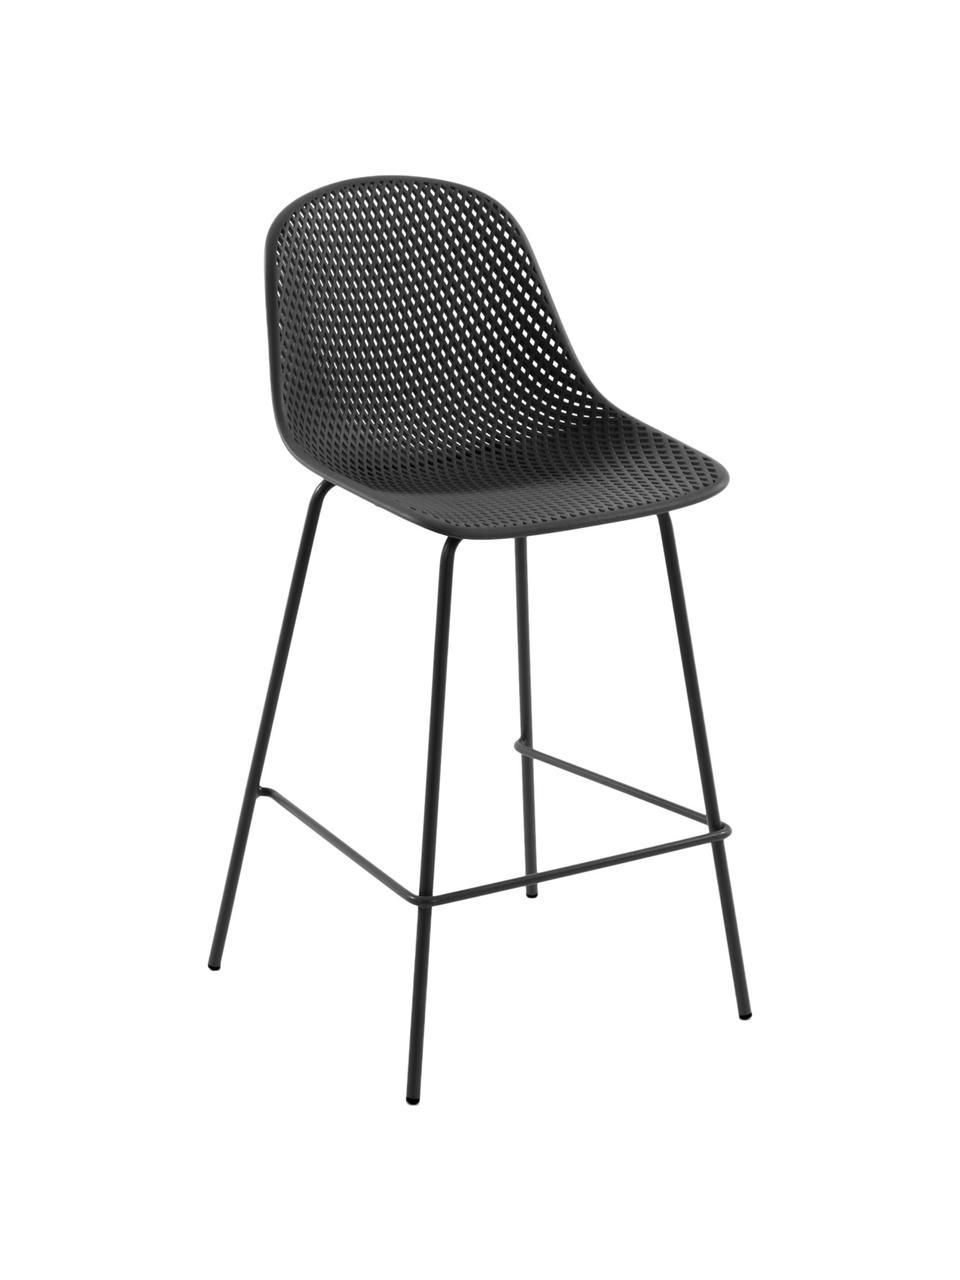 Metall-Barstuhl Quinby in Dunkelgrau, Gestell: Metall, lackiert, Sitzfläche: Kunststoff, lackiert, Dunkelgrau, 48 x 107 cm